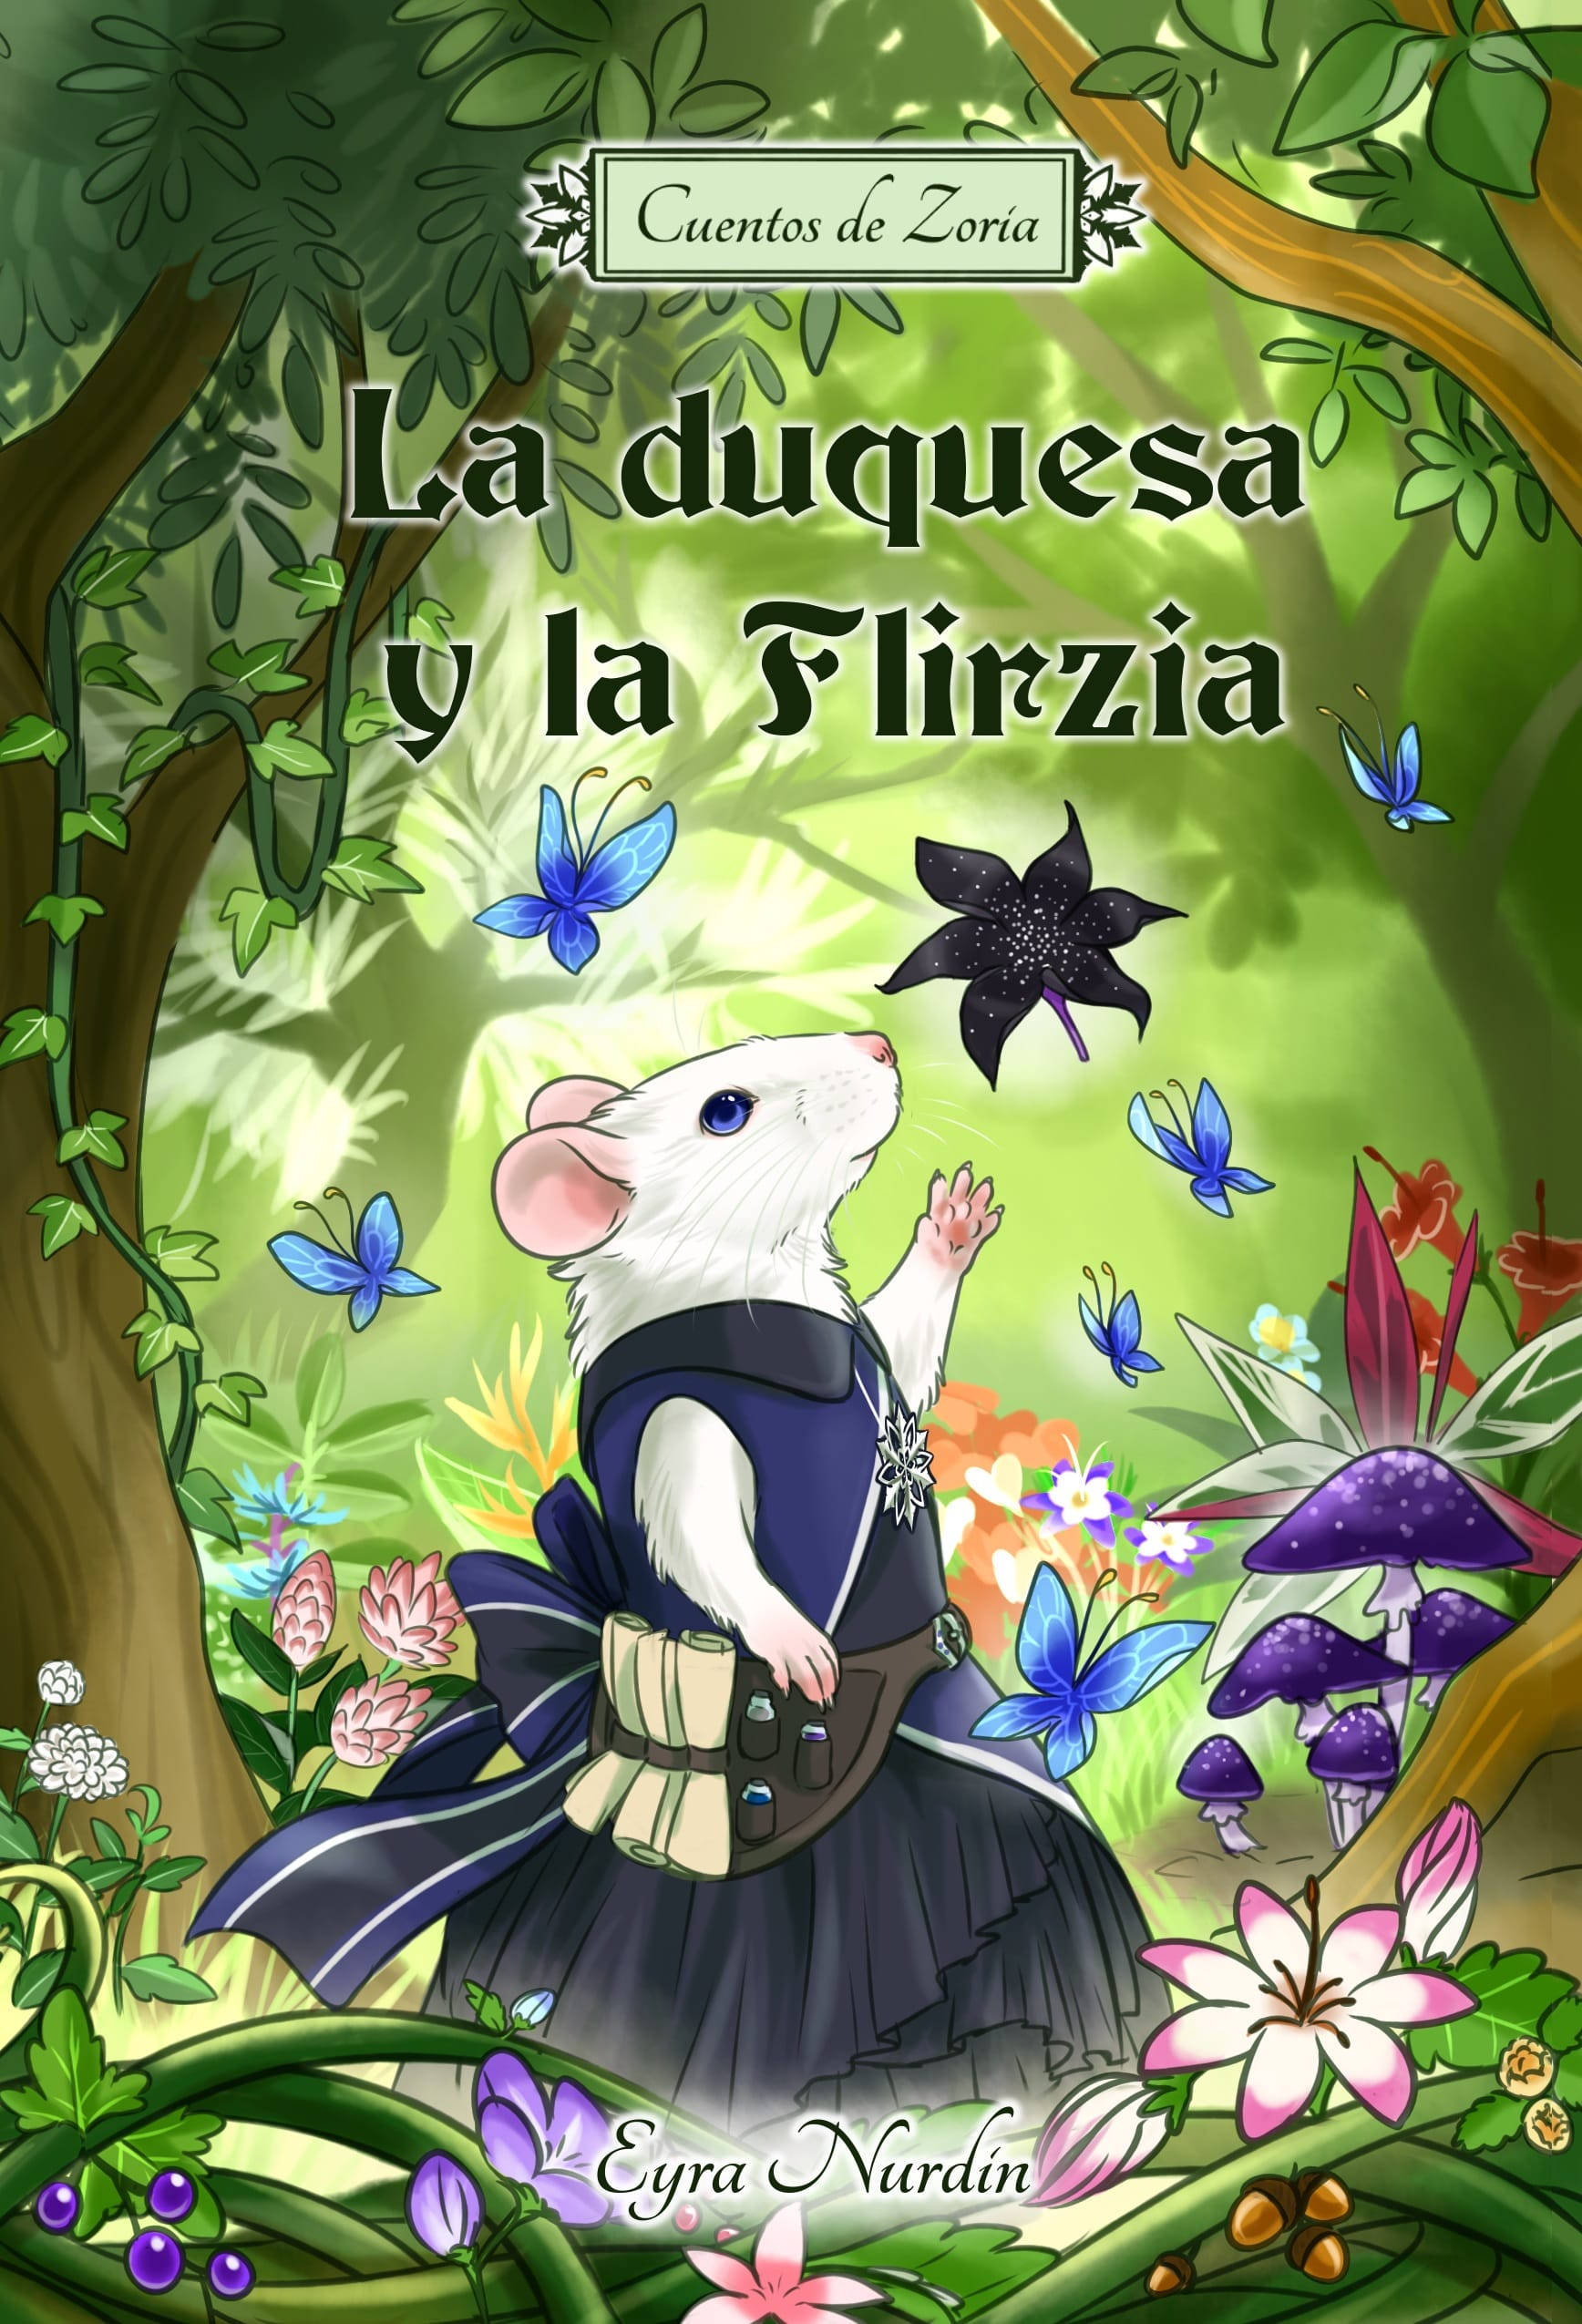 La duquesa y la Flirzia